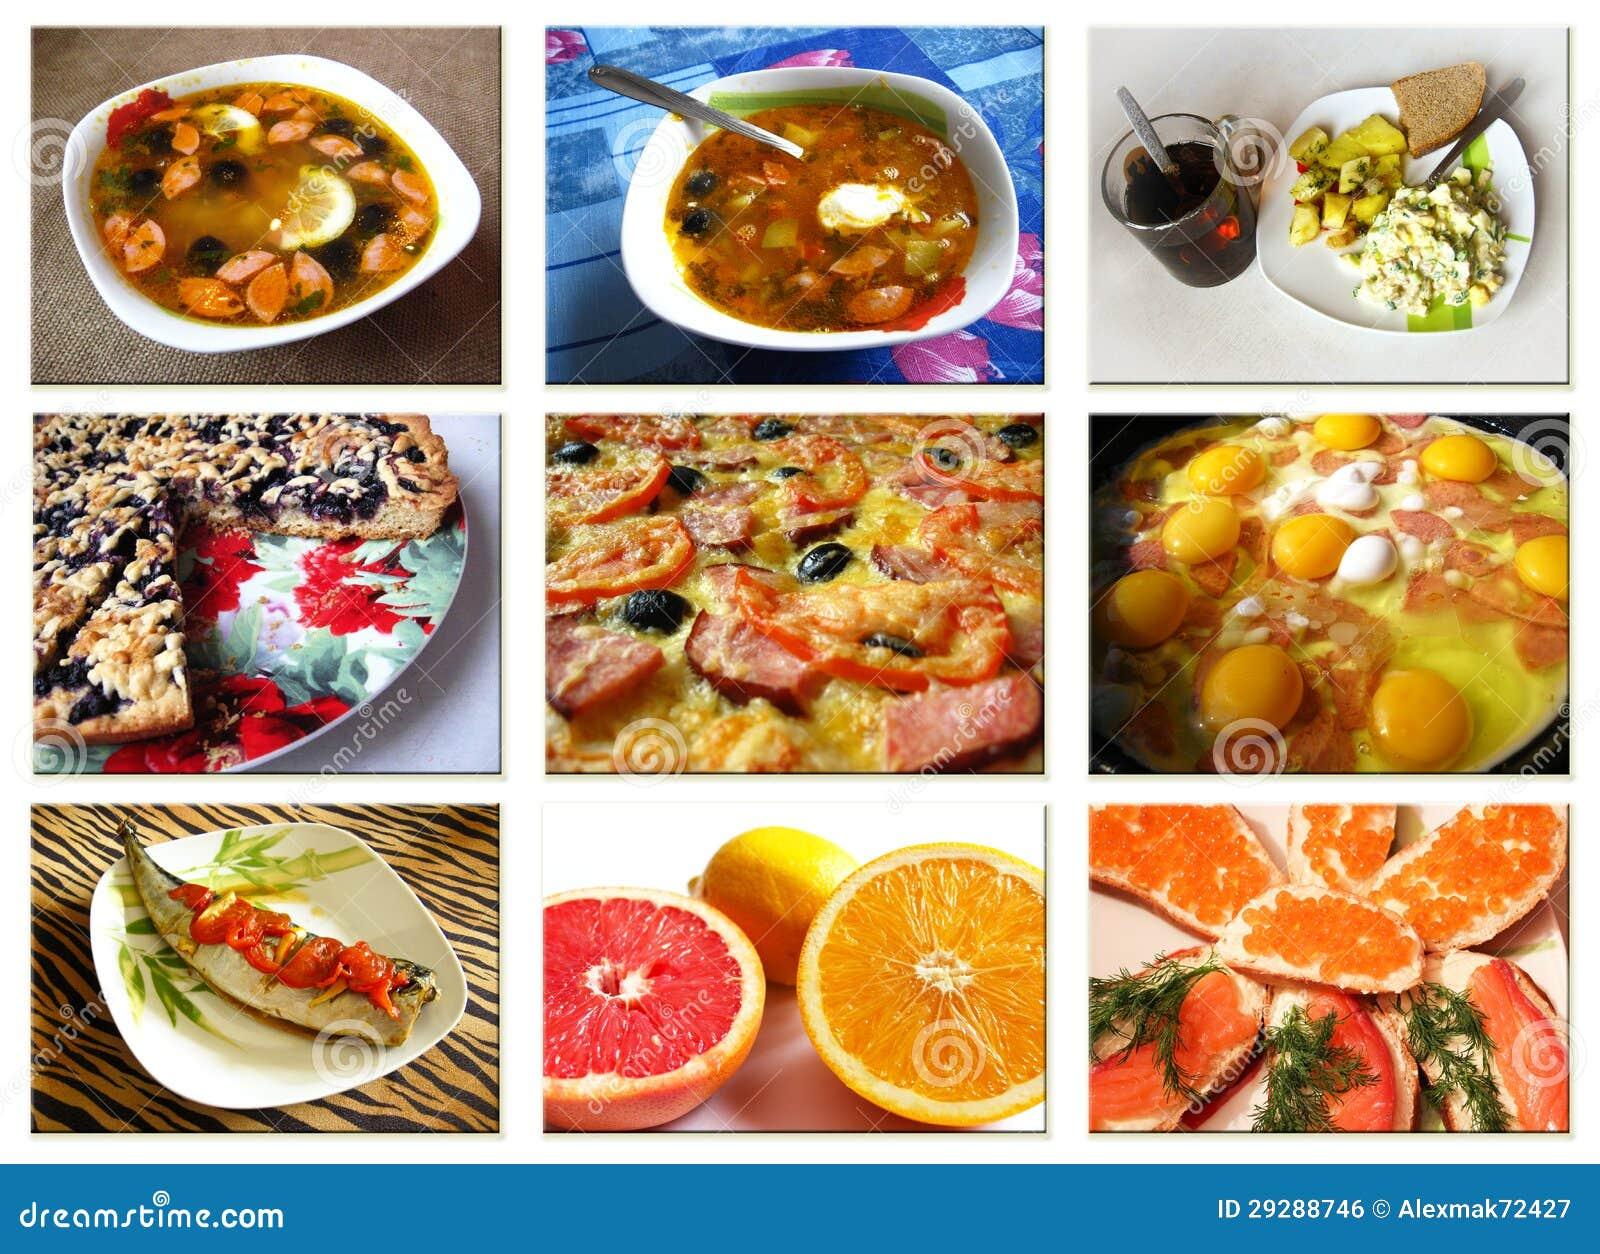 Коллаж от фото различных тарелок